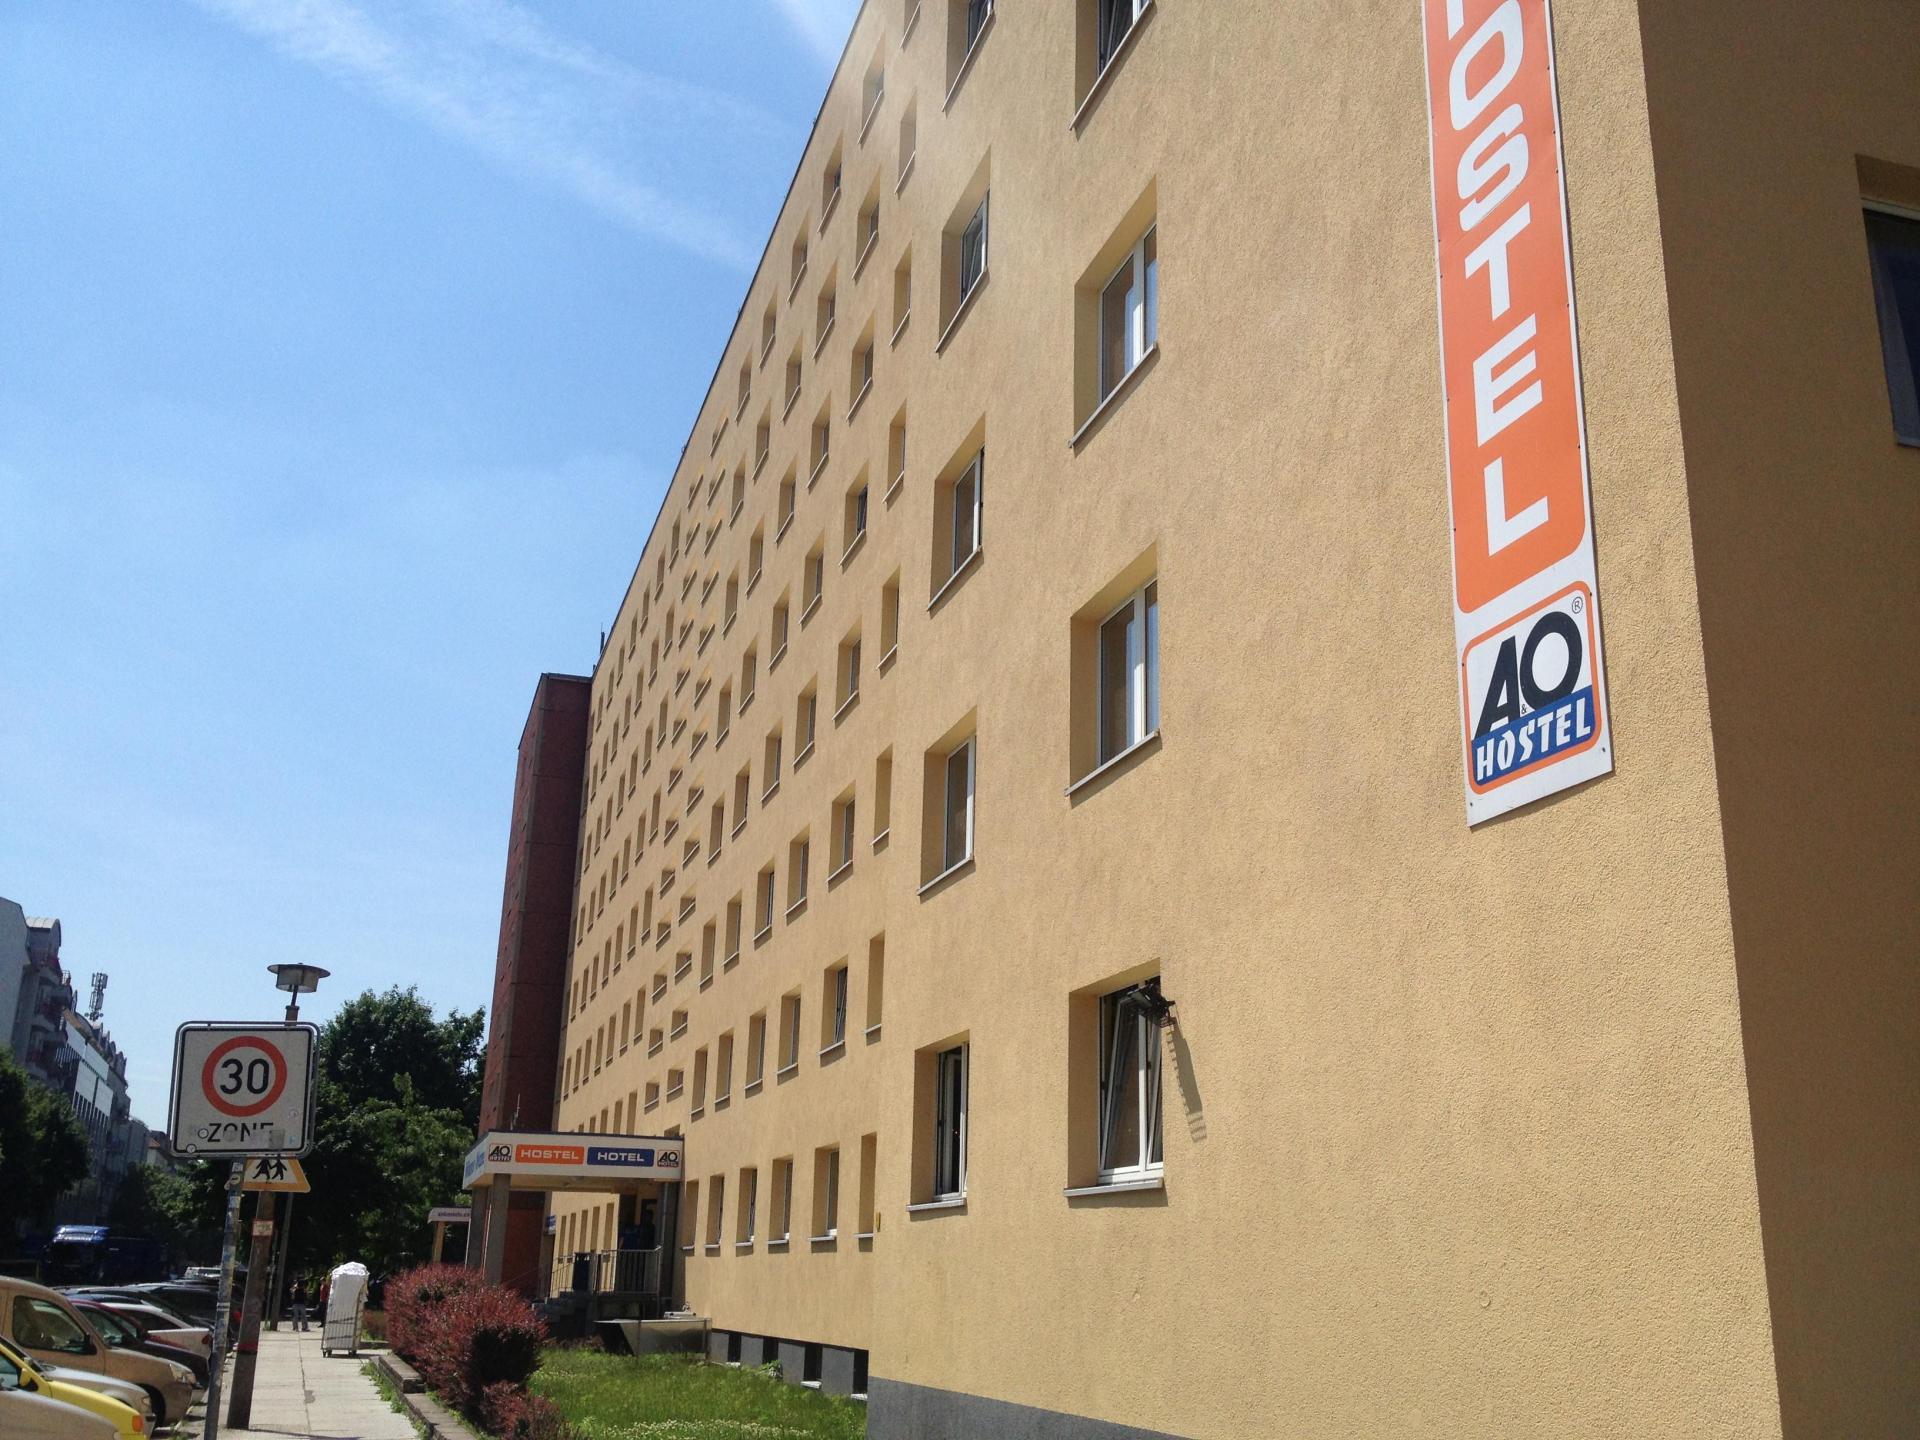 A&O Berlin Mitte Hostel